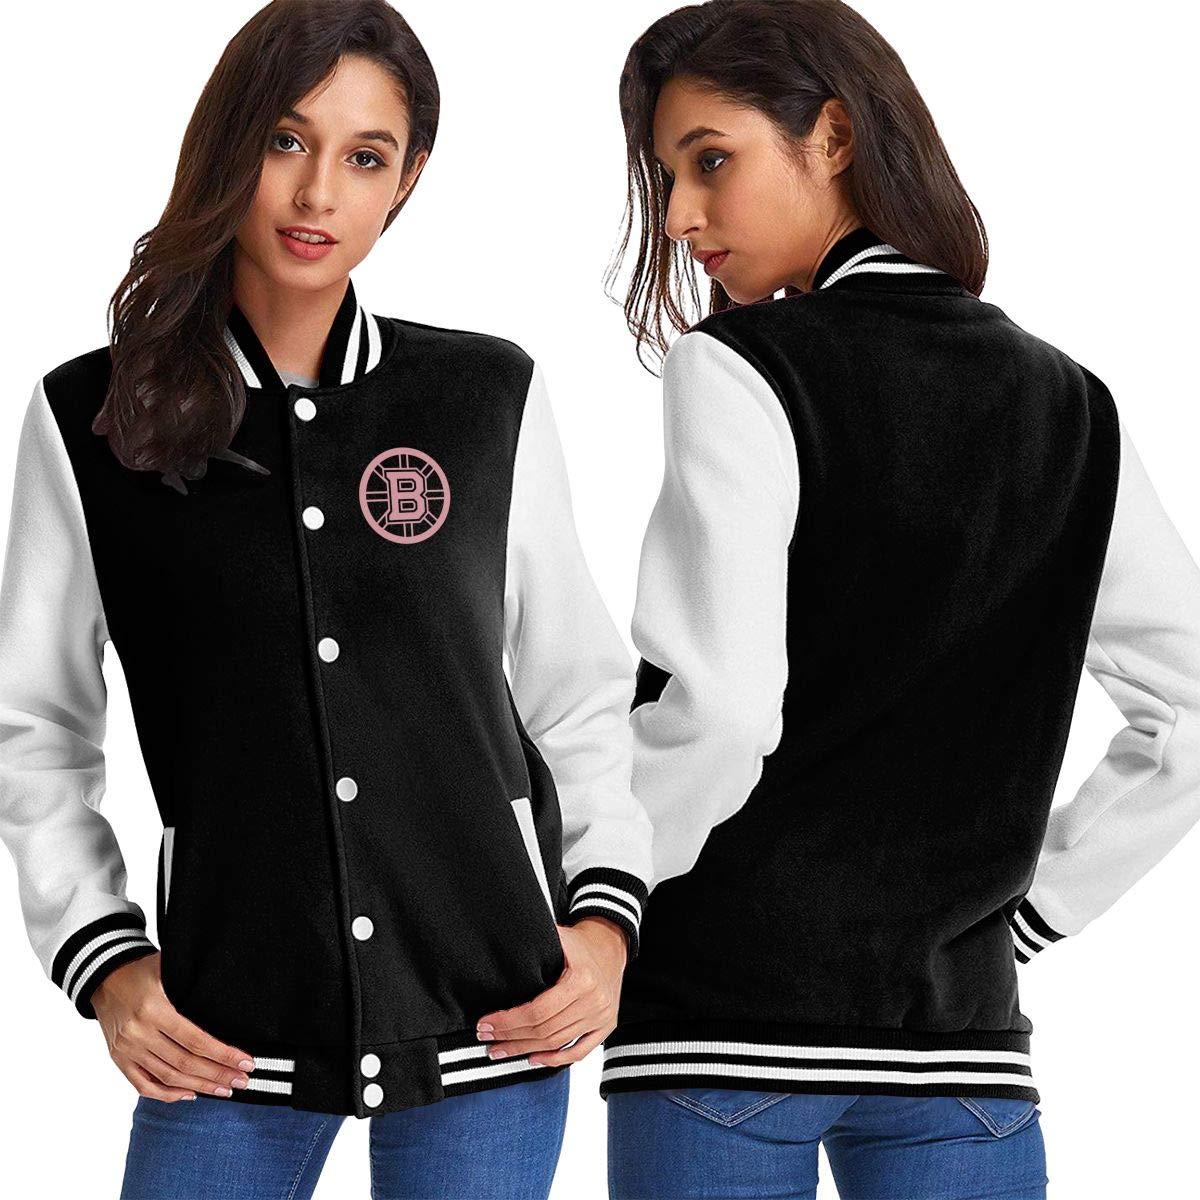 Black Women Basketballsadw PinkPresBostonBruinsLogo Baseball Uniform Jacket